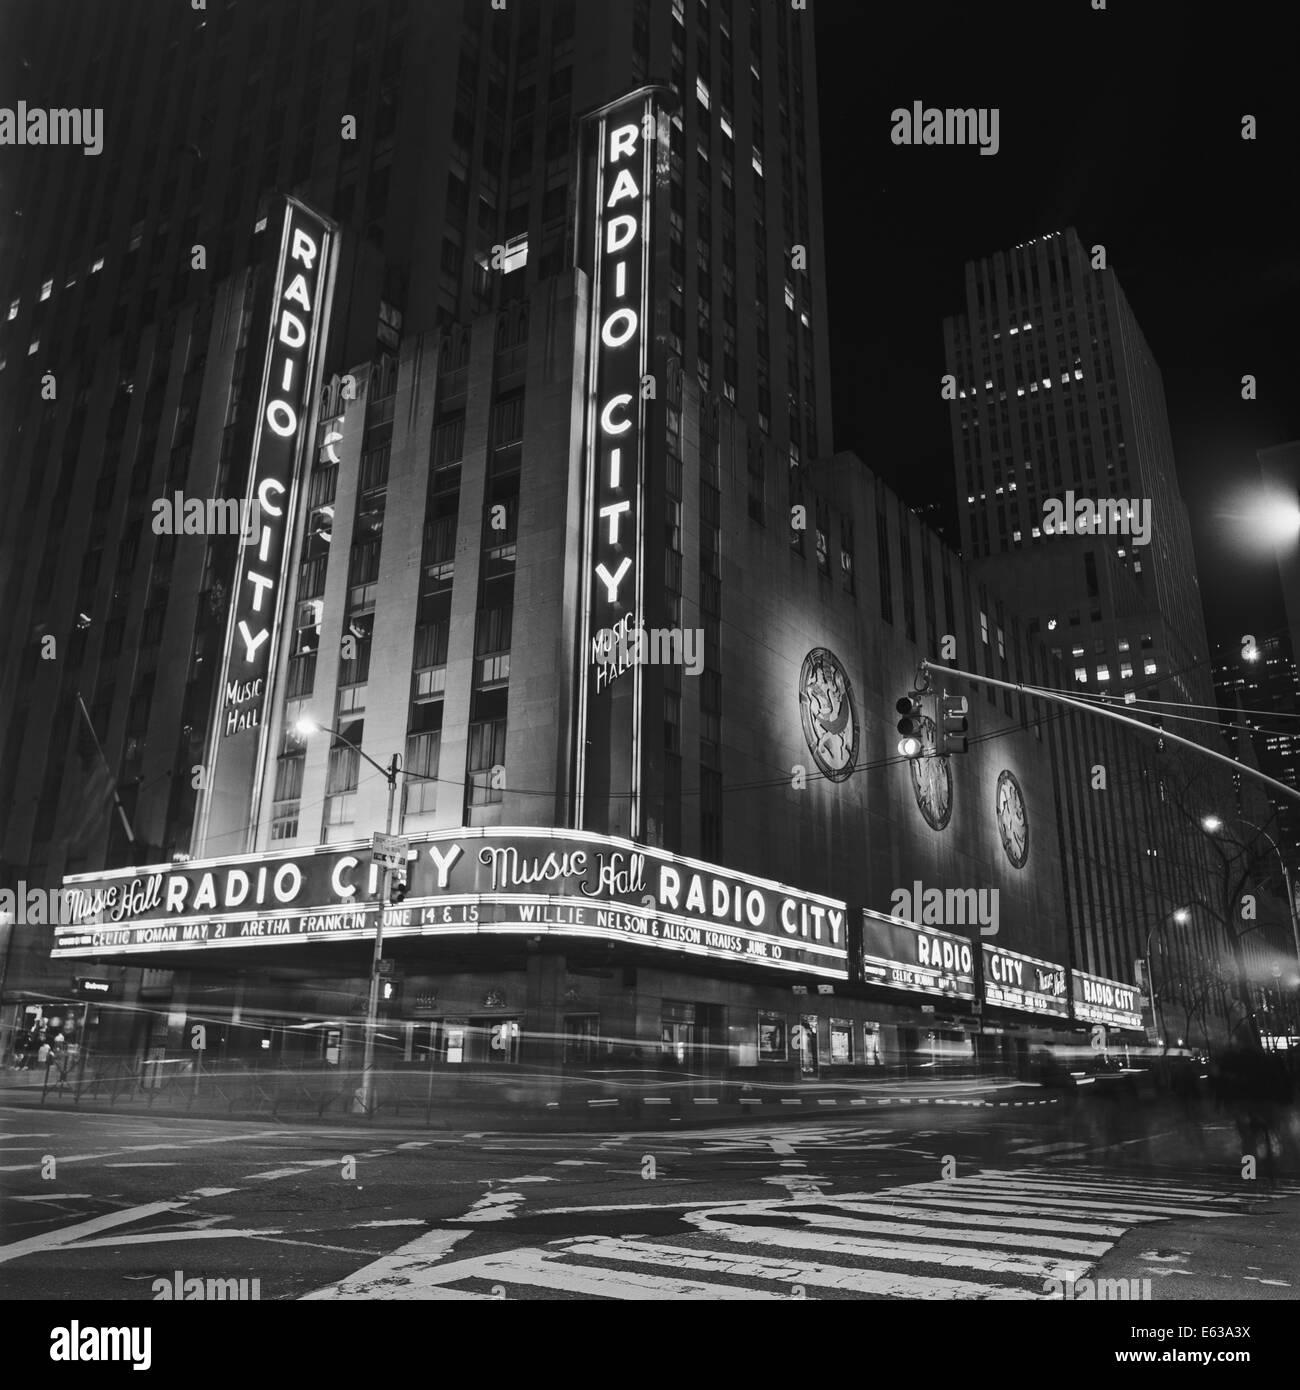 Radio City Music Hall by Night - Stock Image